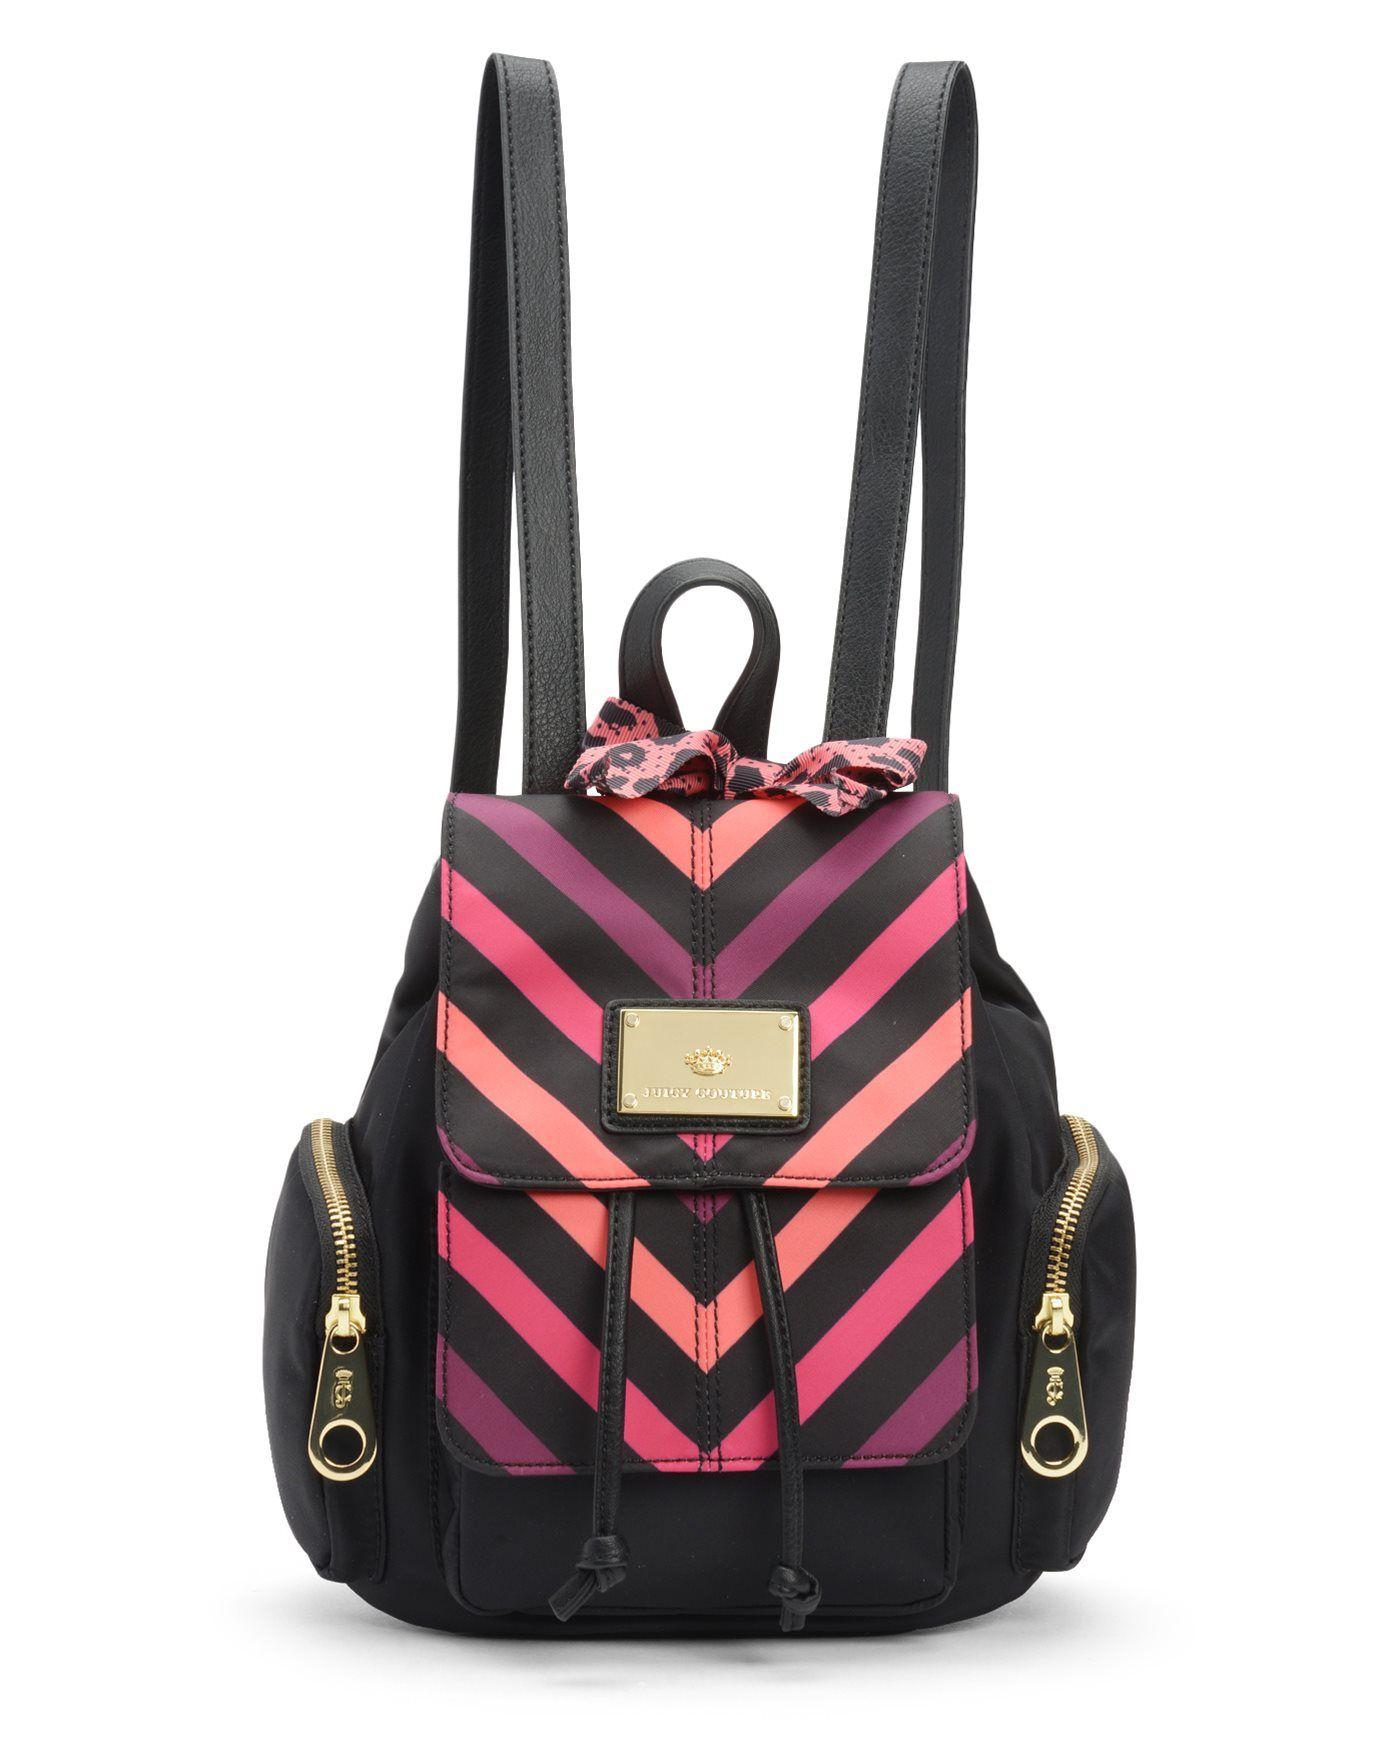 26d6821c81 MALIBU NYLON MINI BACKPACK - Juicy Couture